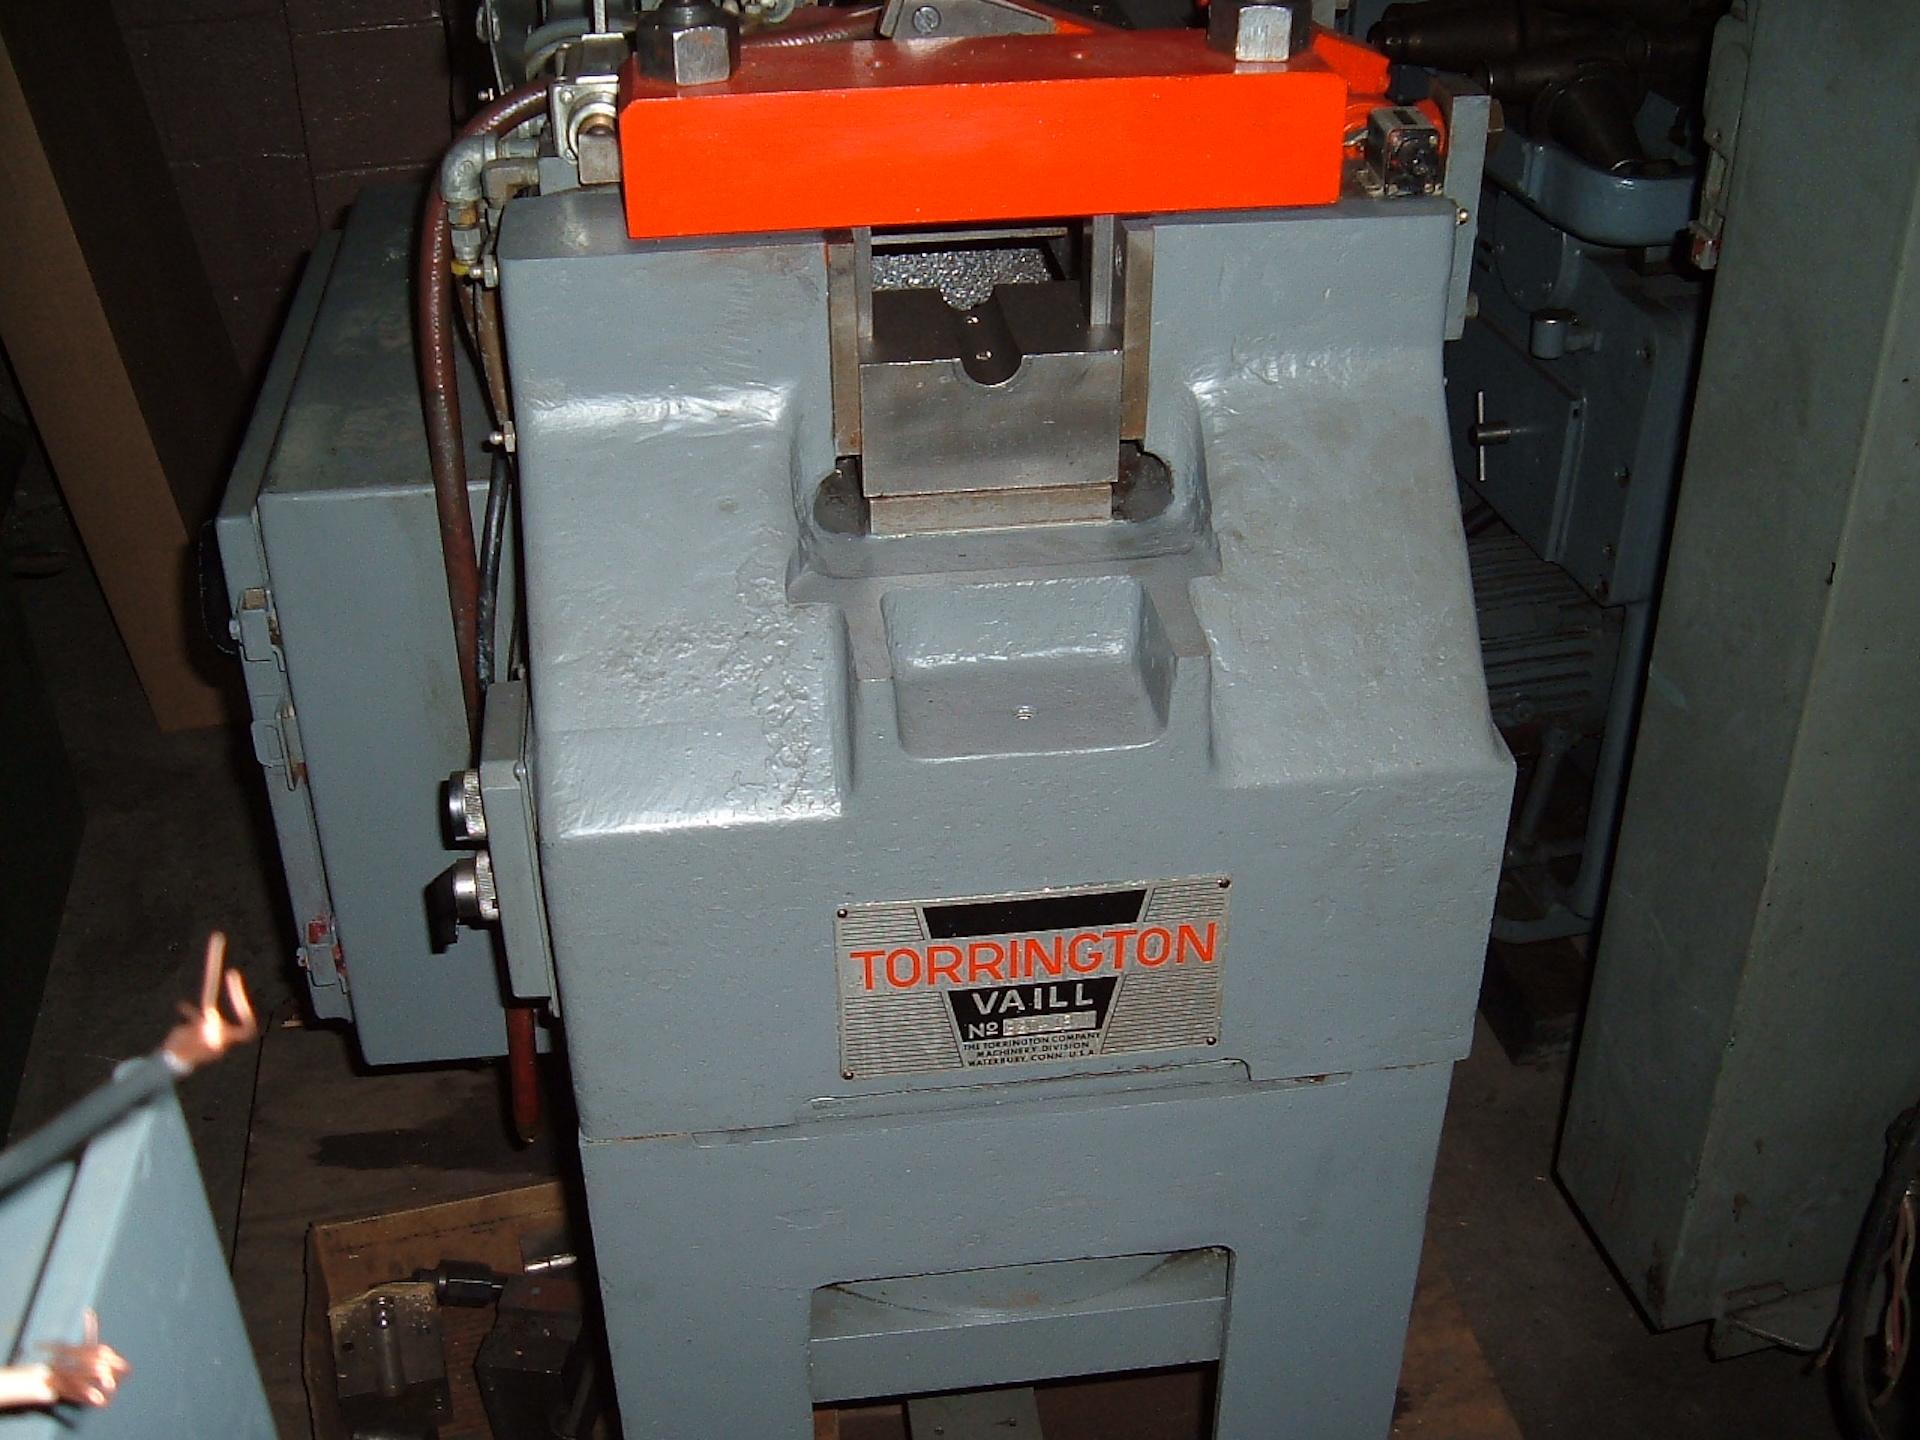 TORRINGTON-VAILL #220 END FORMING MACHINE, MFG-1987, SER# 220-18